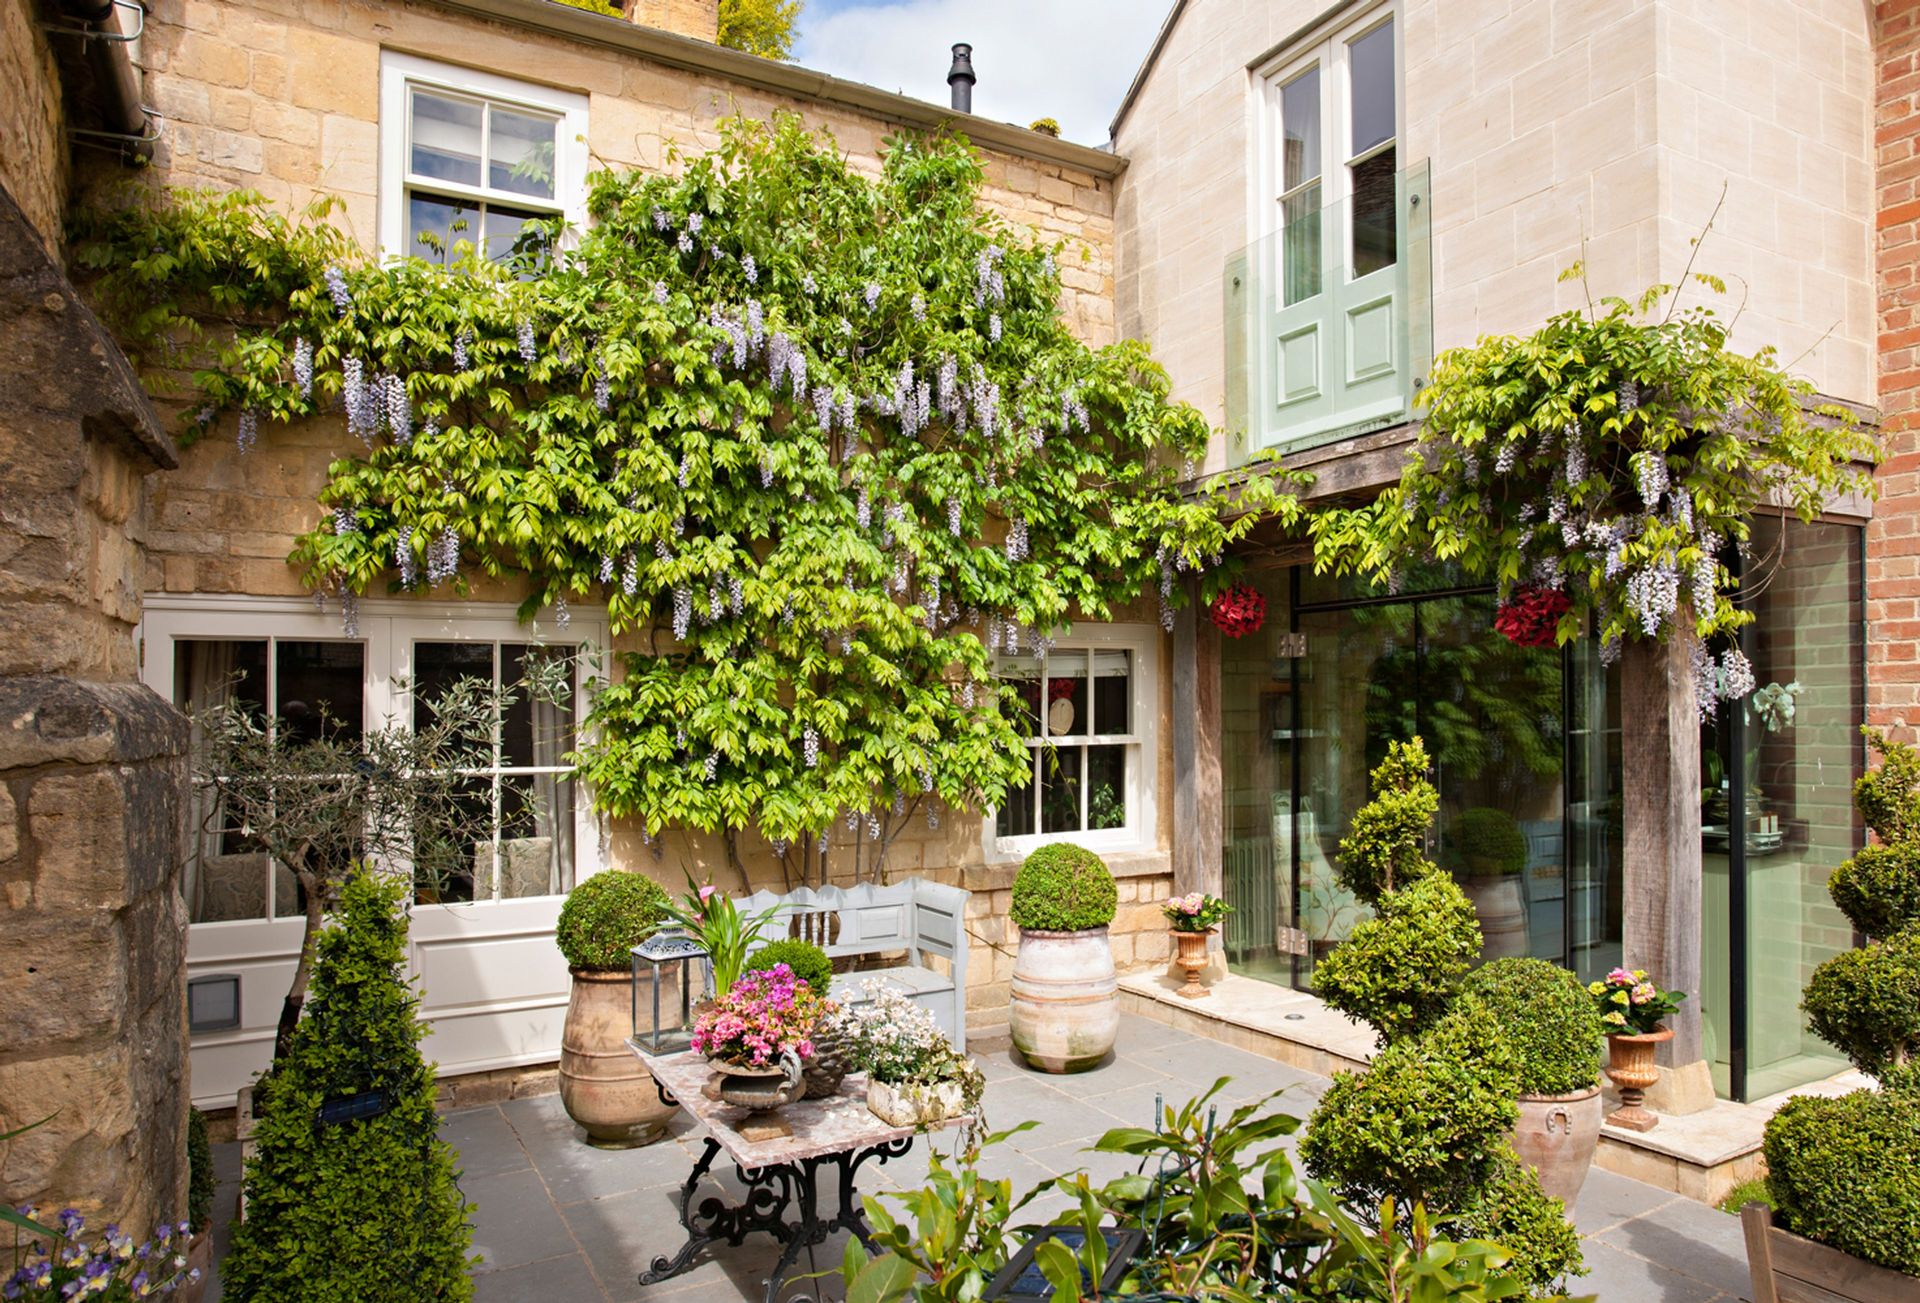 View of the Courtyard Garden